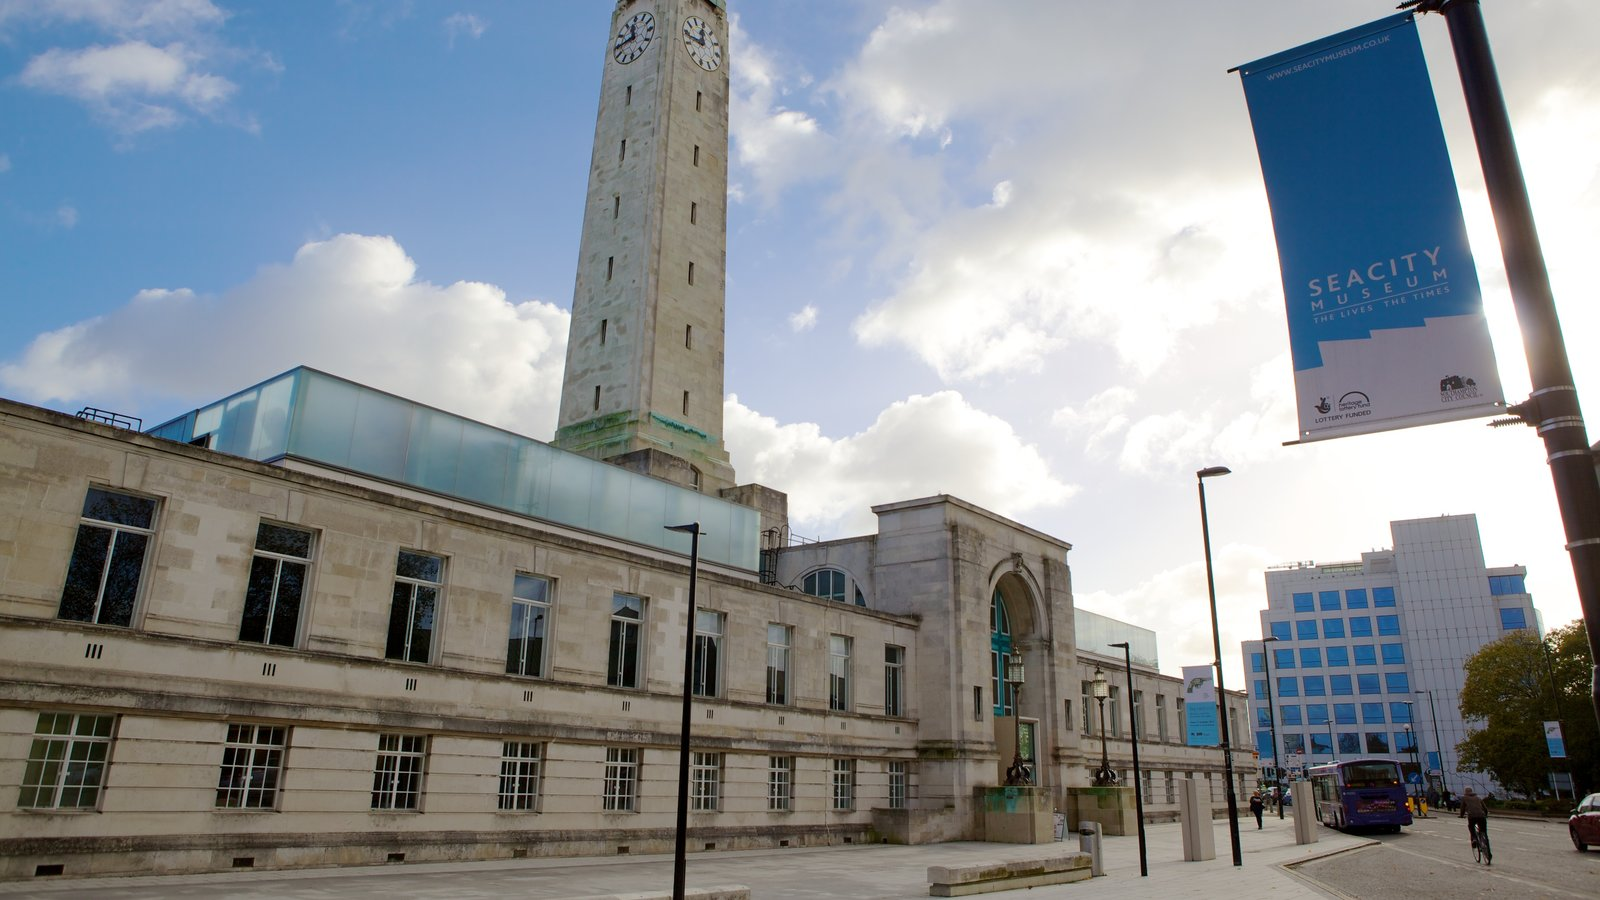 Southampton ofreciendo patrimonio de arquitectura